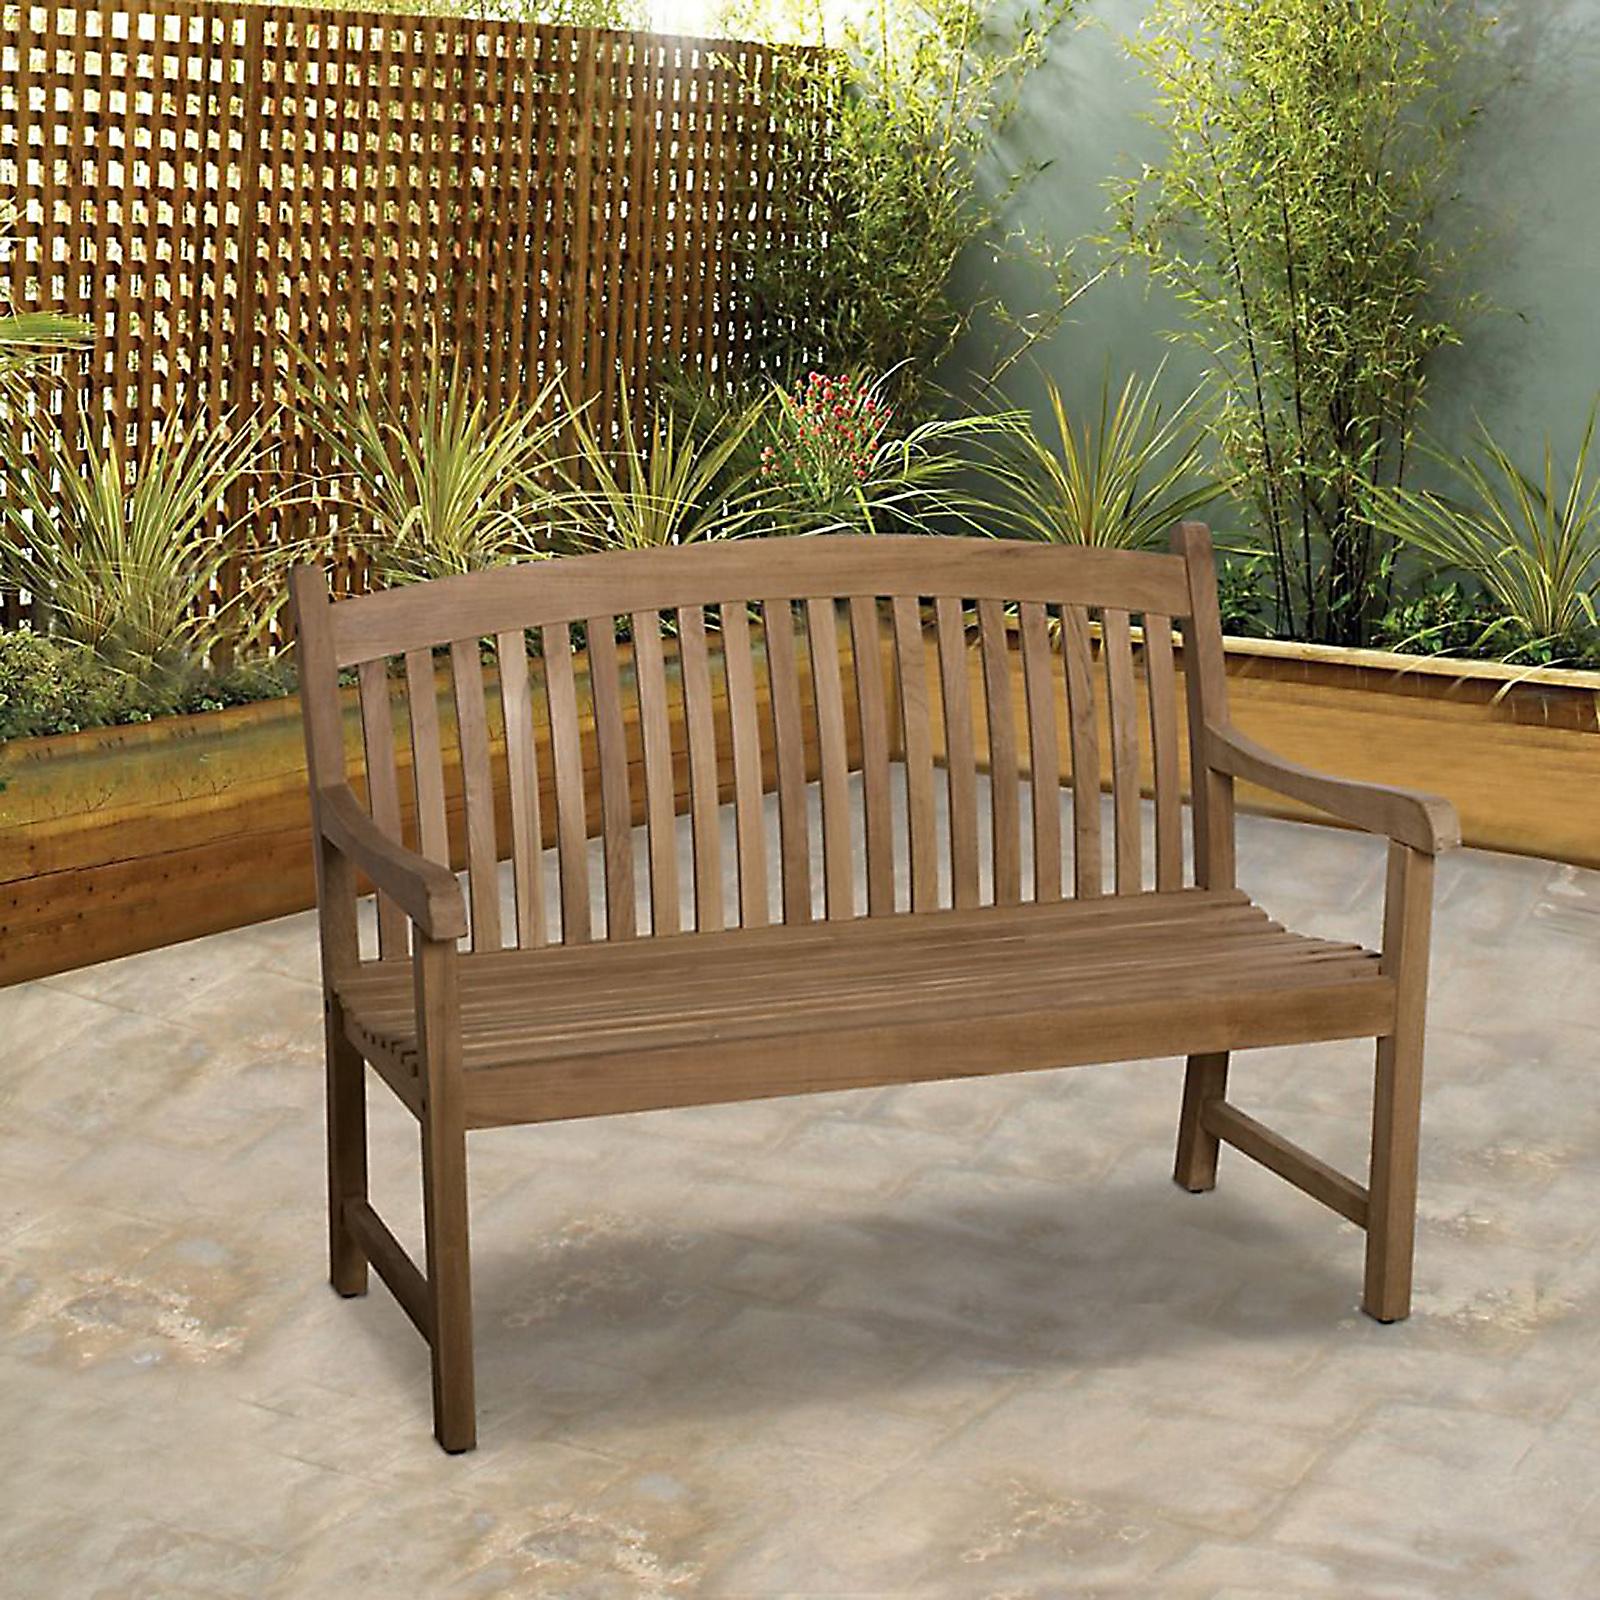 "Mandalay Teak Wood 4"" Patio Bench"